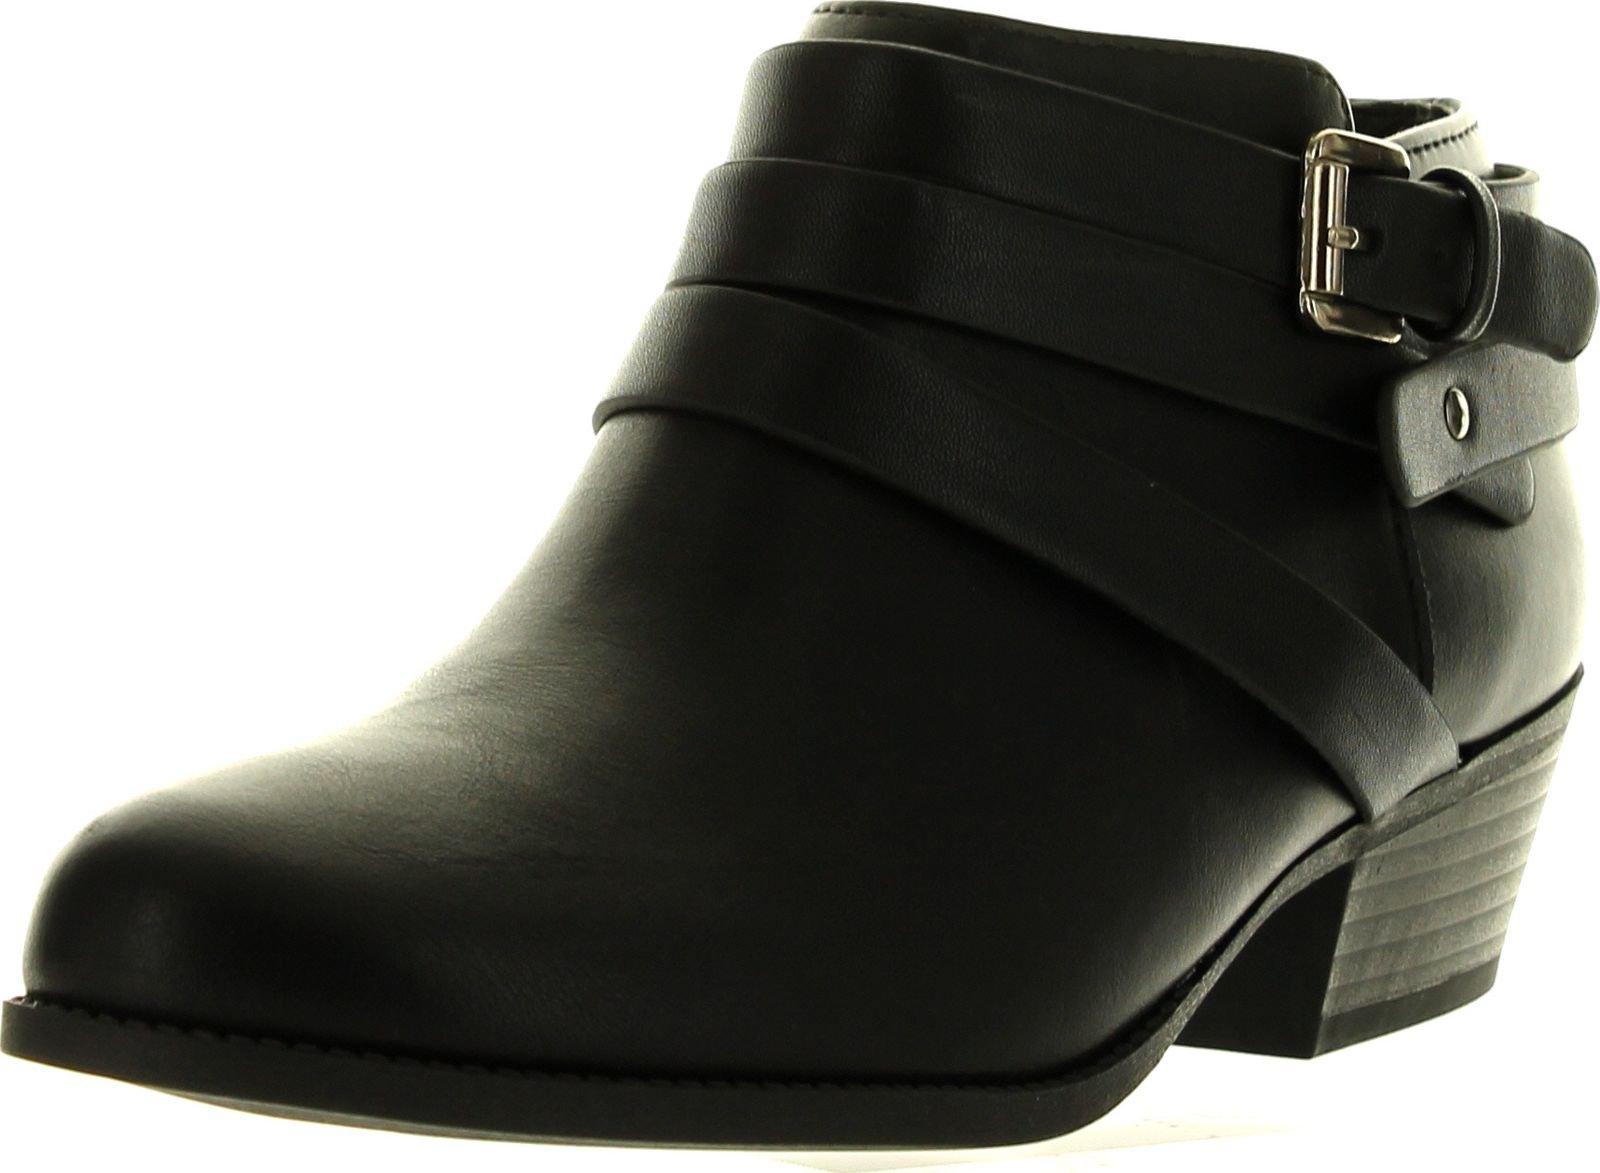 Soda Alum Womens Stylish Buckle Strap Dress Ankle Bootie,Black,7